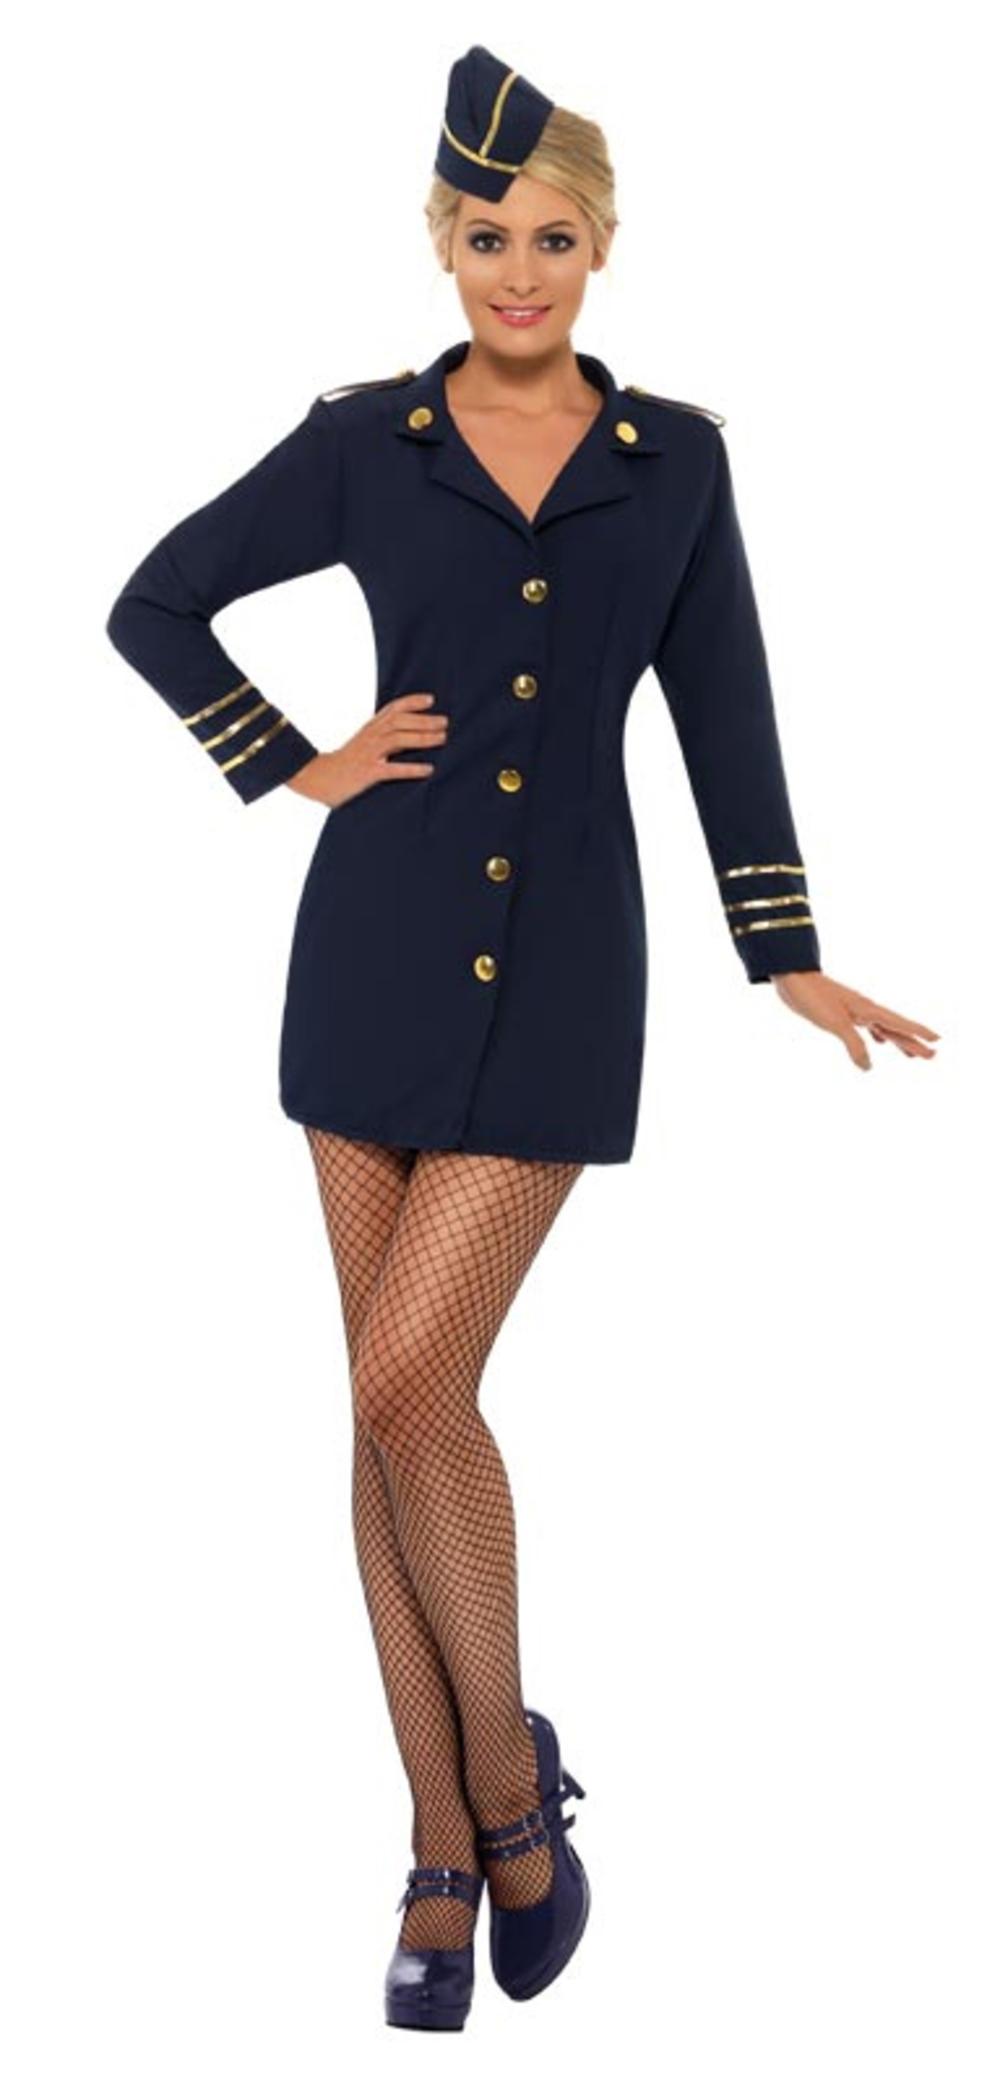 Flight Attendant Ladies Fancy Dress Uniform Navy Women Air Hostess Adult Costume